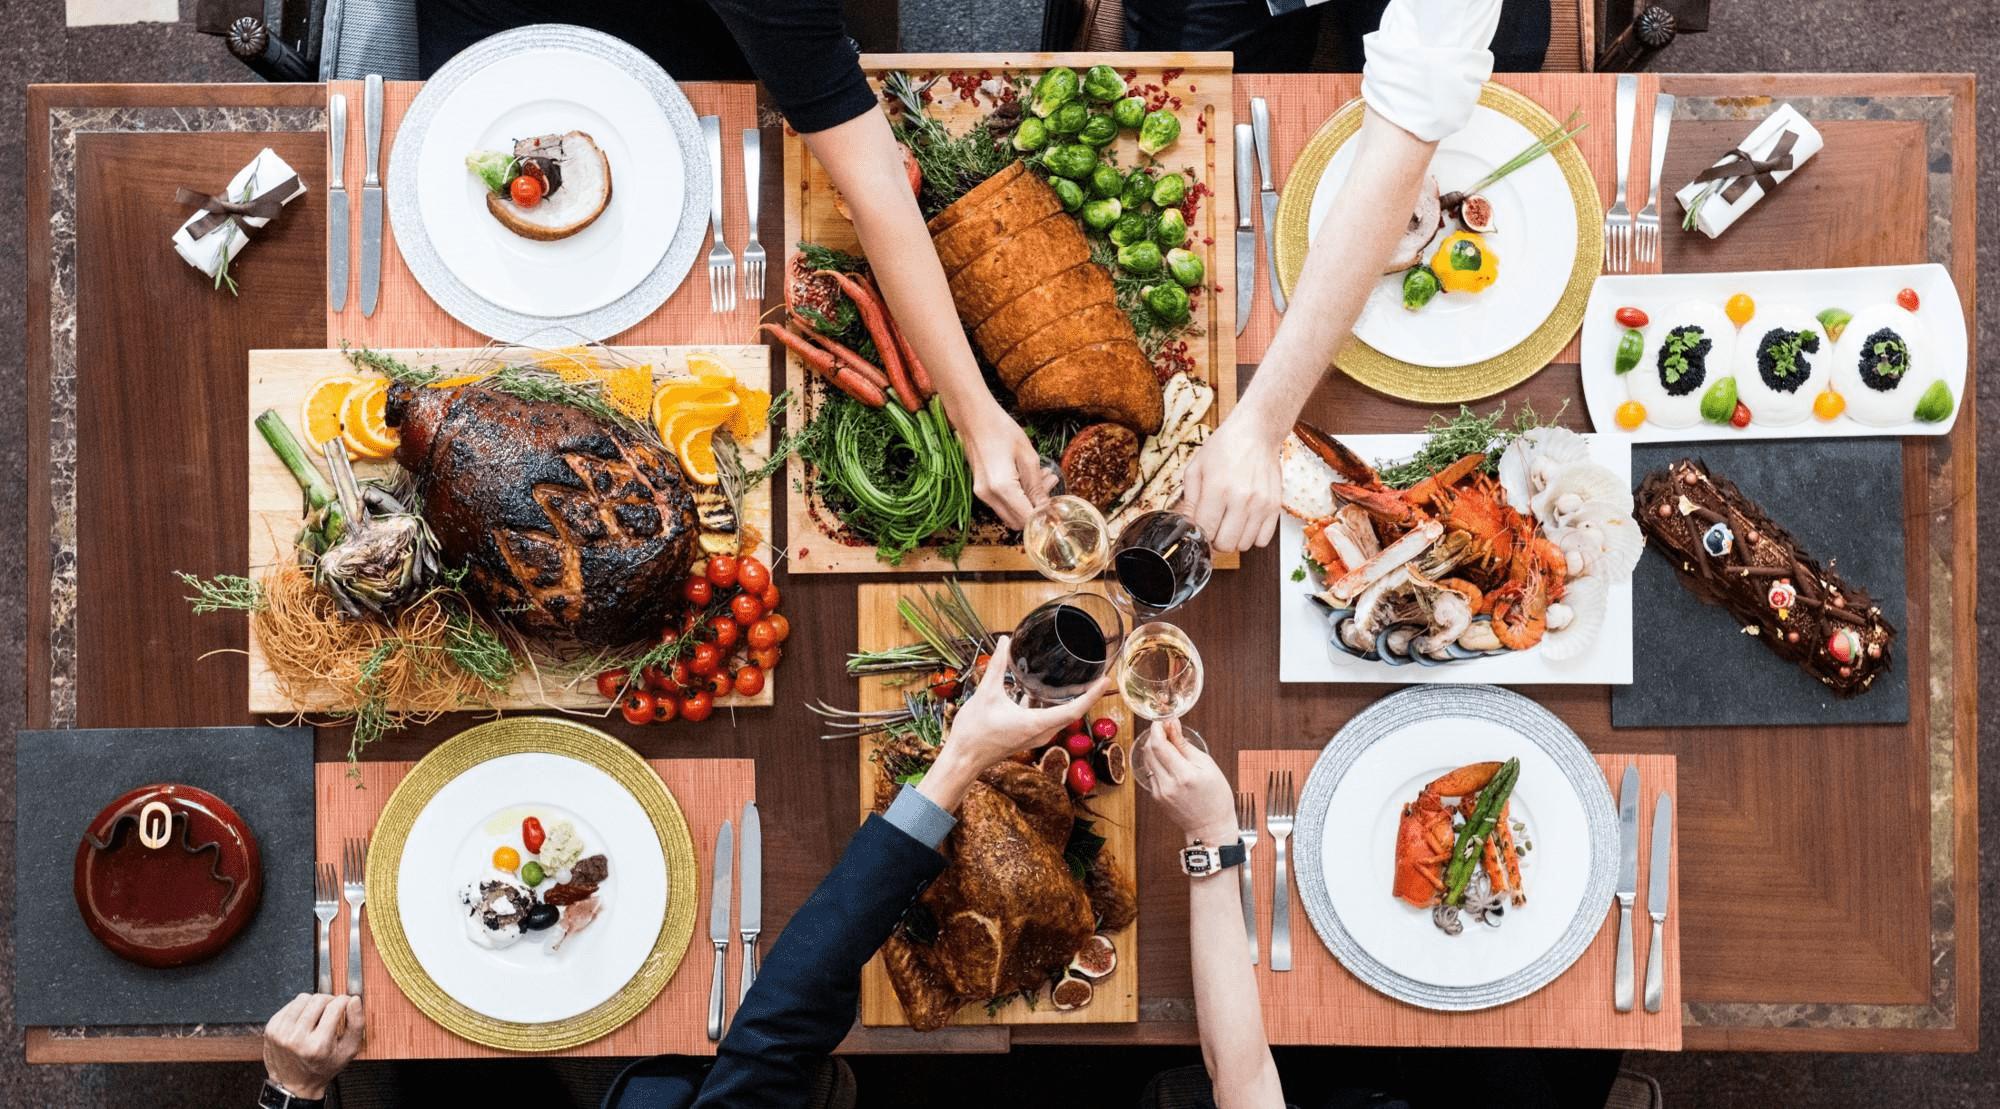 10 Christmas Takeaway & Delivery Deals In 2018 - Festive Roasts, Paella, & 20% Off Foodpanda Orders